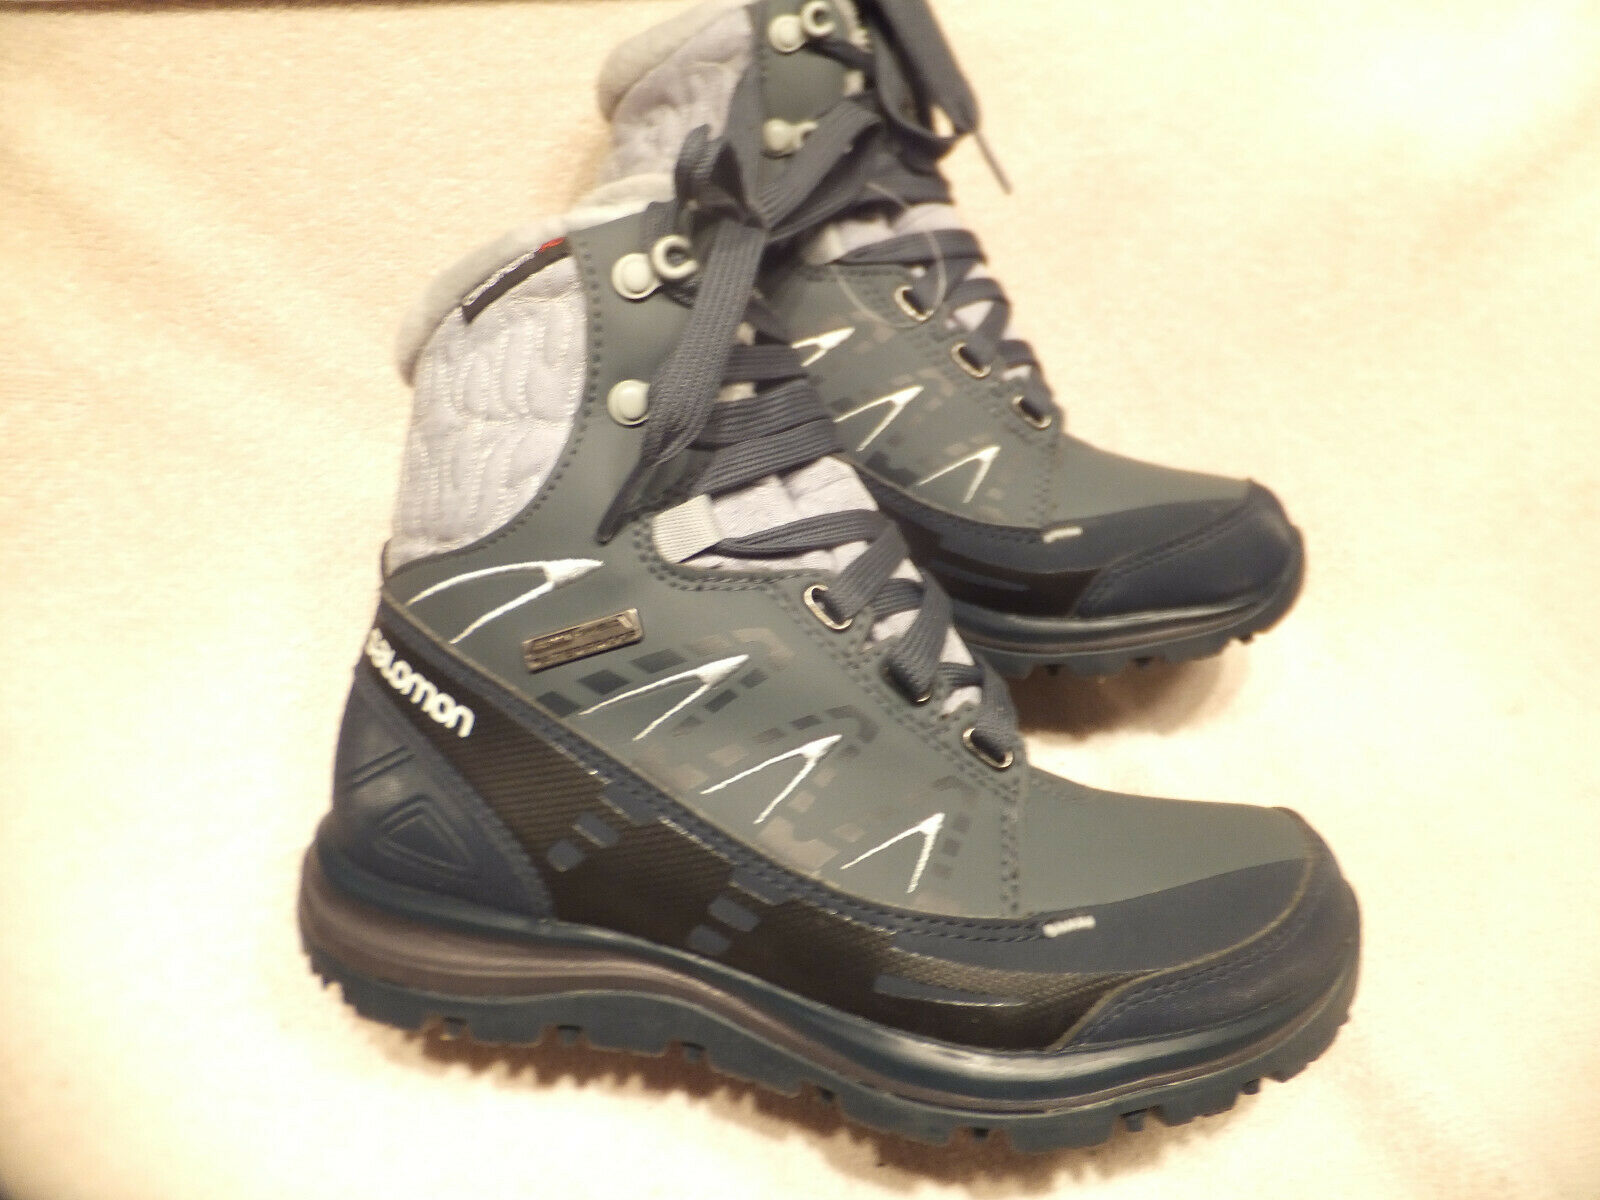 Salomon donna  Snow Hiking avvio Climasield Sz.5.5M EU36 2  3 MAI WORN  vendita outlet